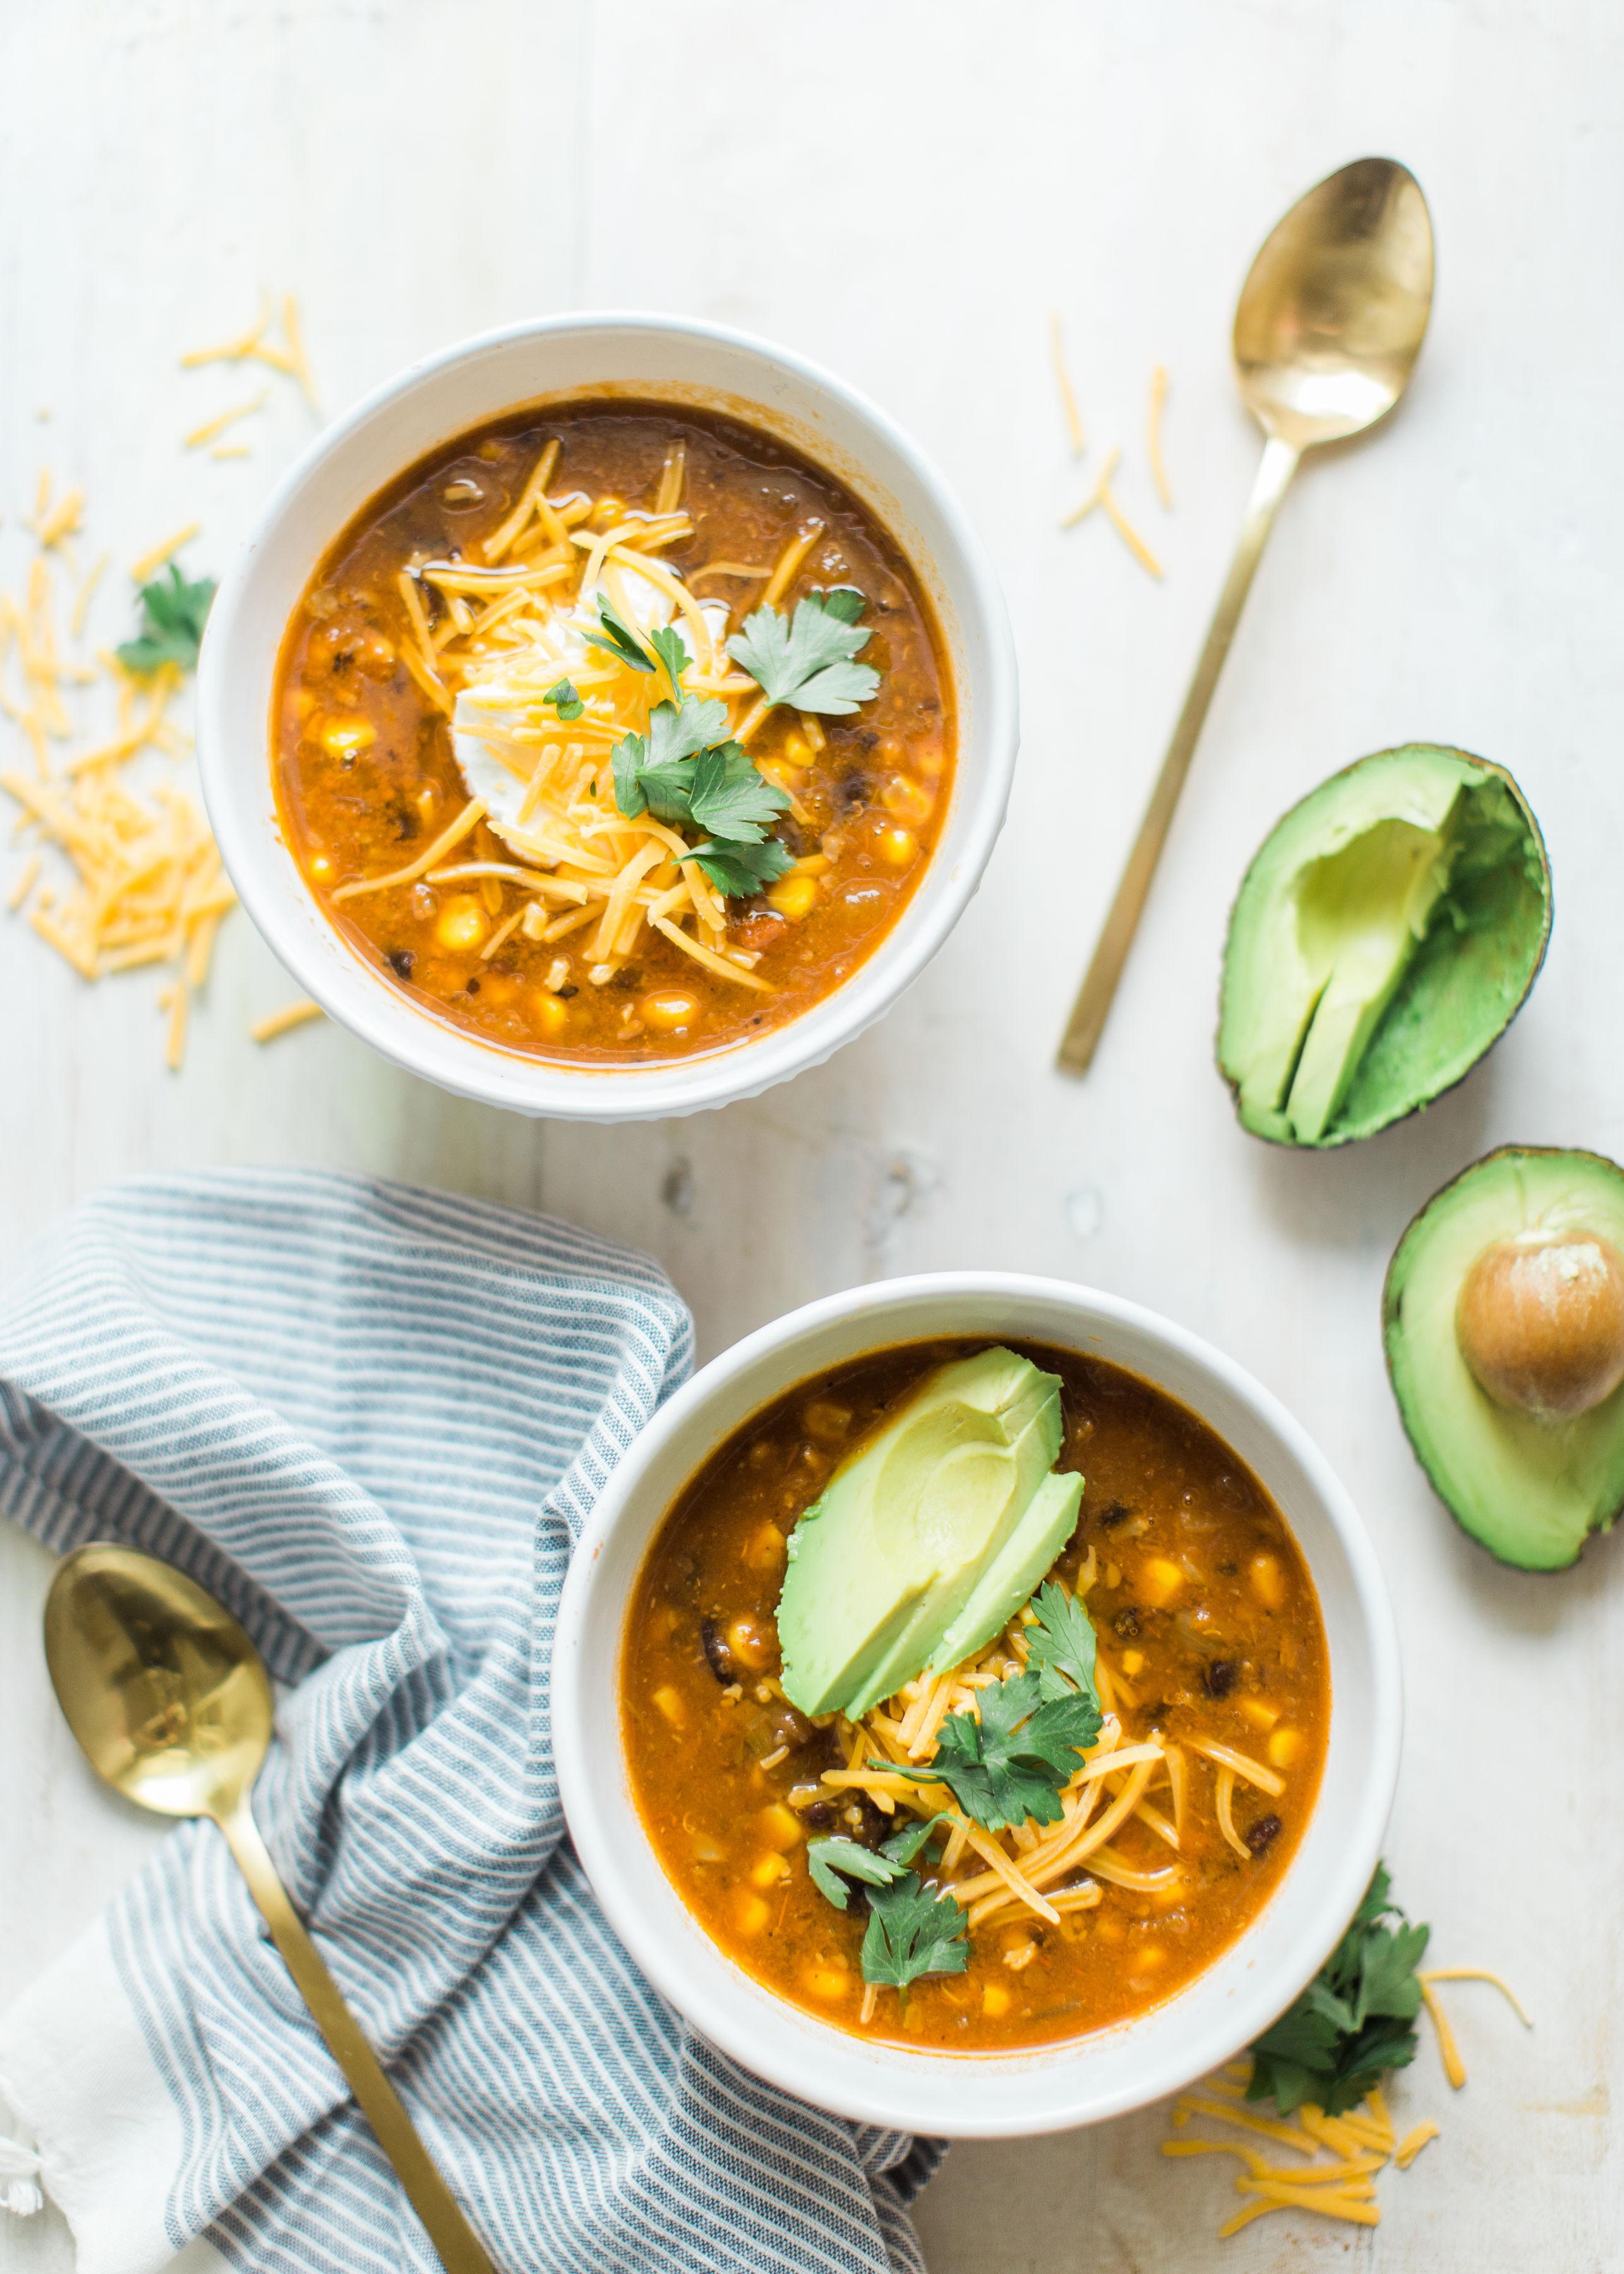 Vegetarian Harvest Chili #instantpot #crockpot #instantpotchili | glitterinc.com | @glitterinc